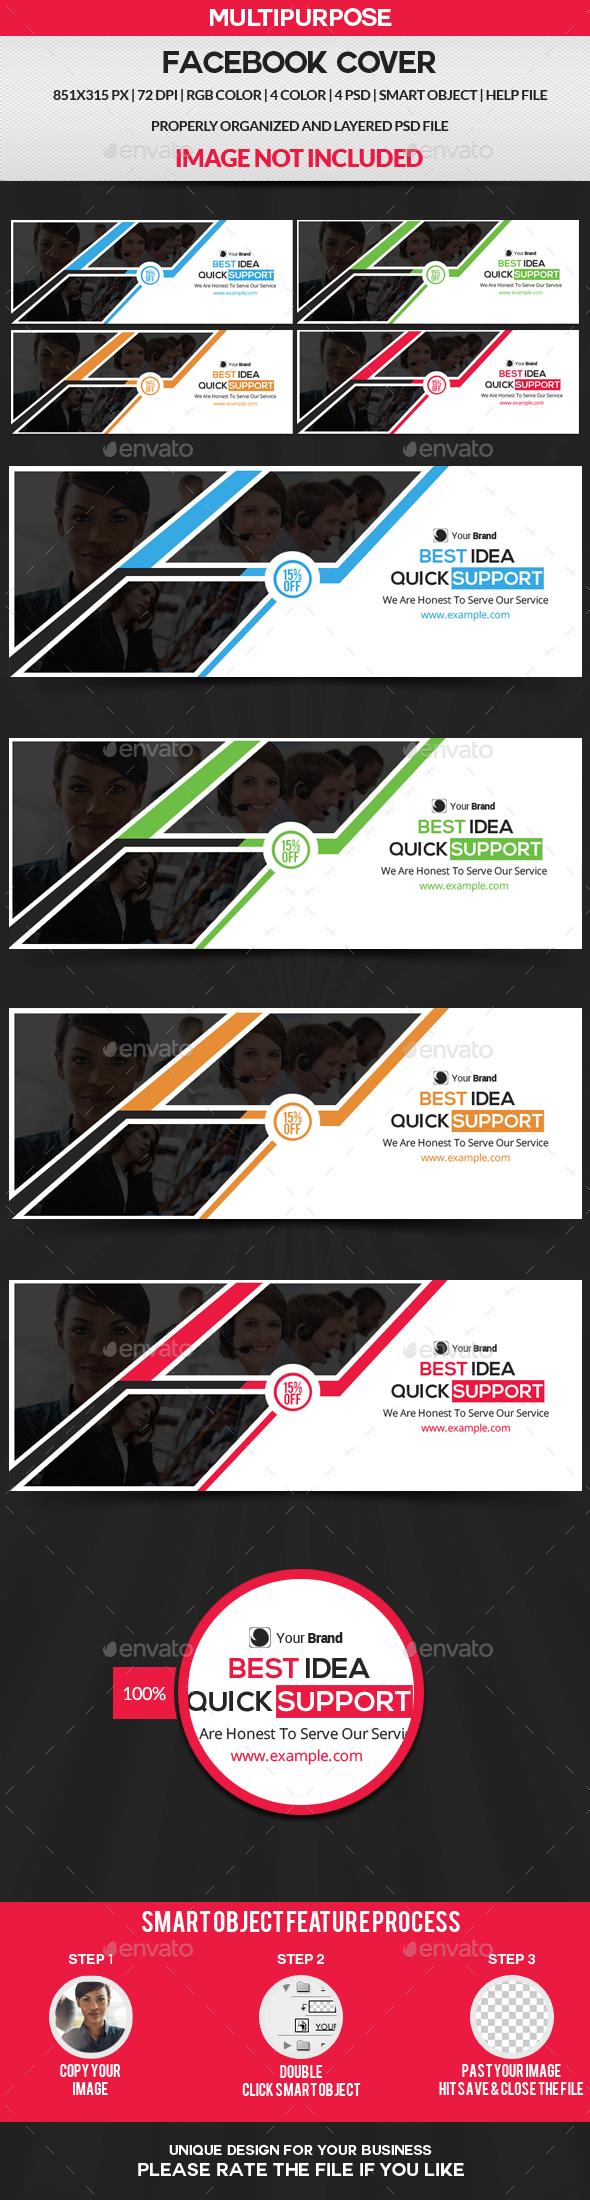 Facebook Cover - 4 Color - Facebook Timeline Covers Social Media